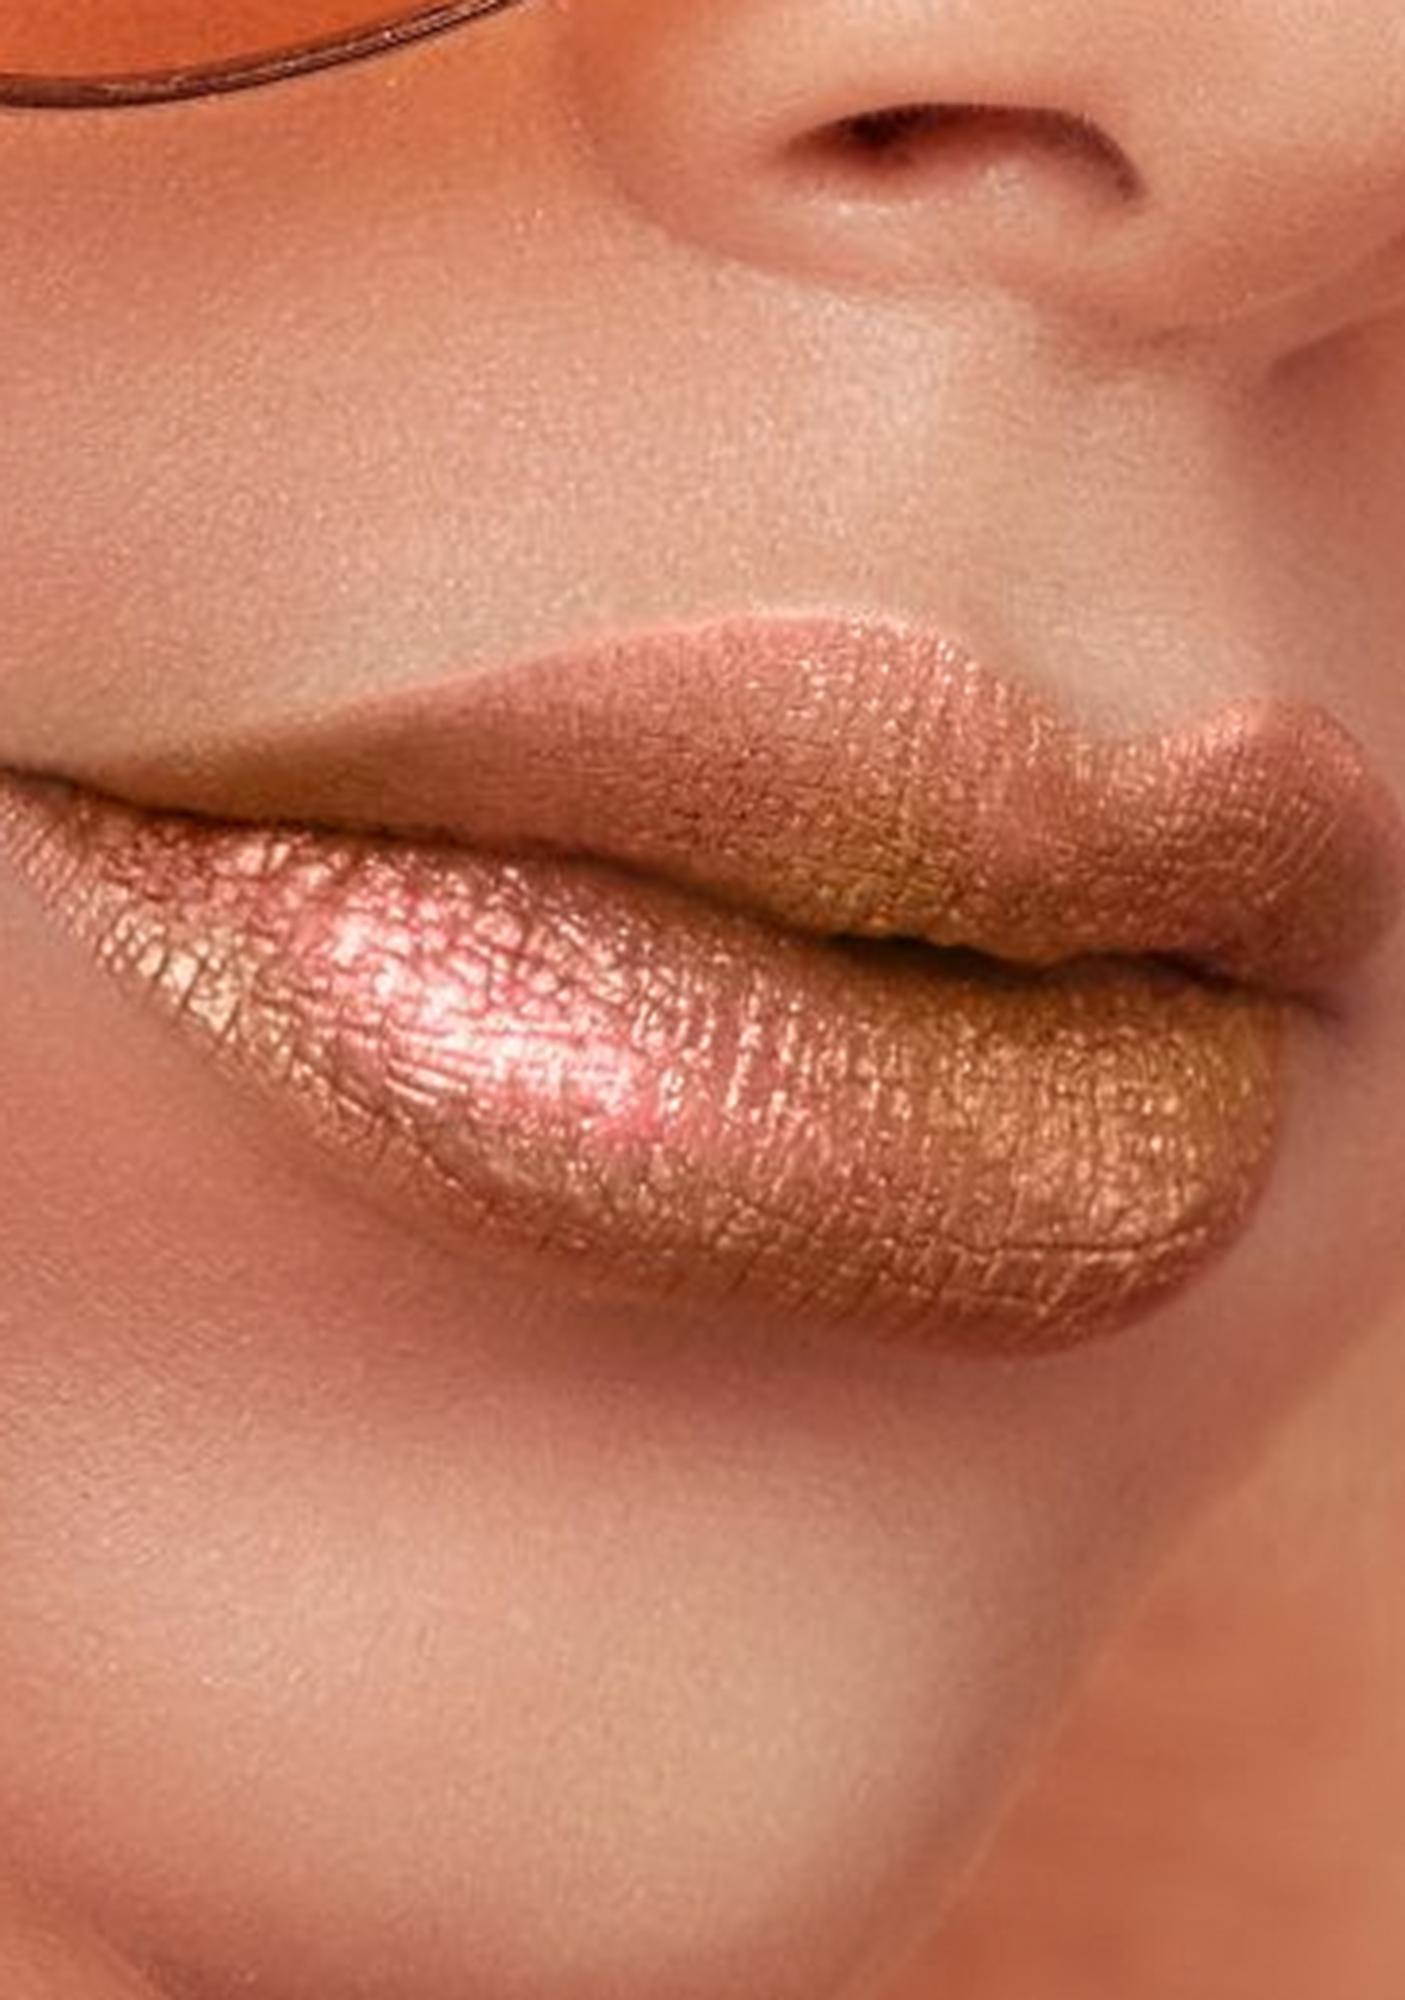 Shablam Cosmetics Enchantress Mutant Iridescent Liquid Lipstick